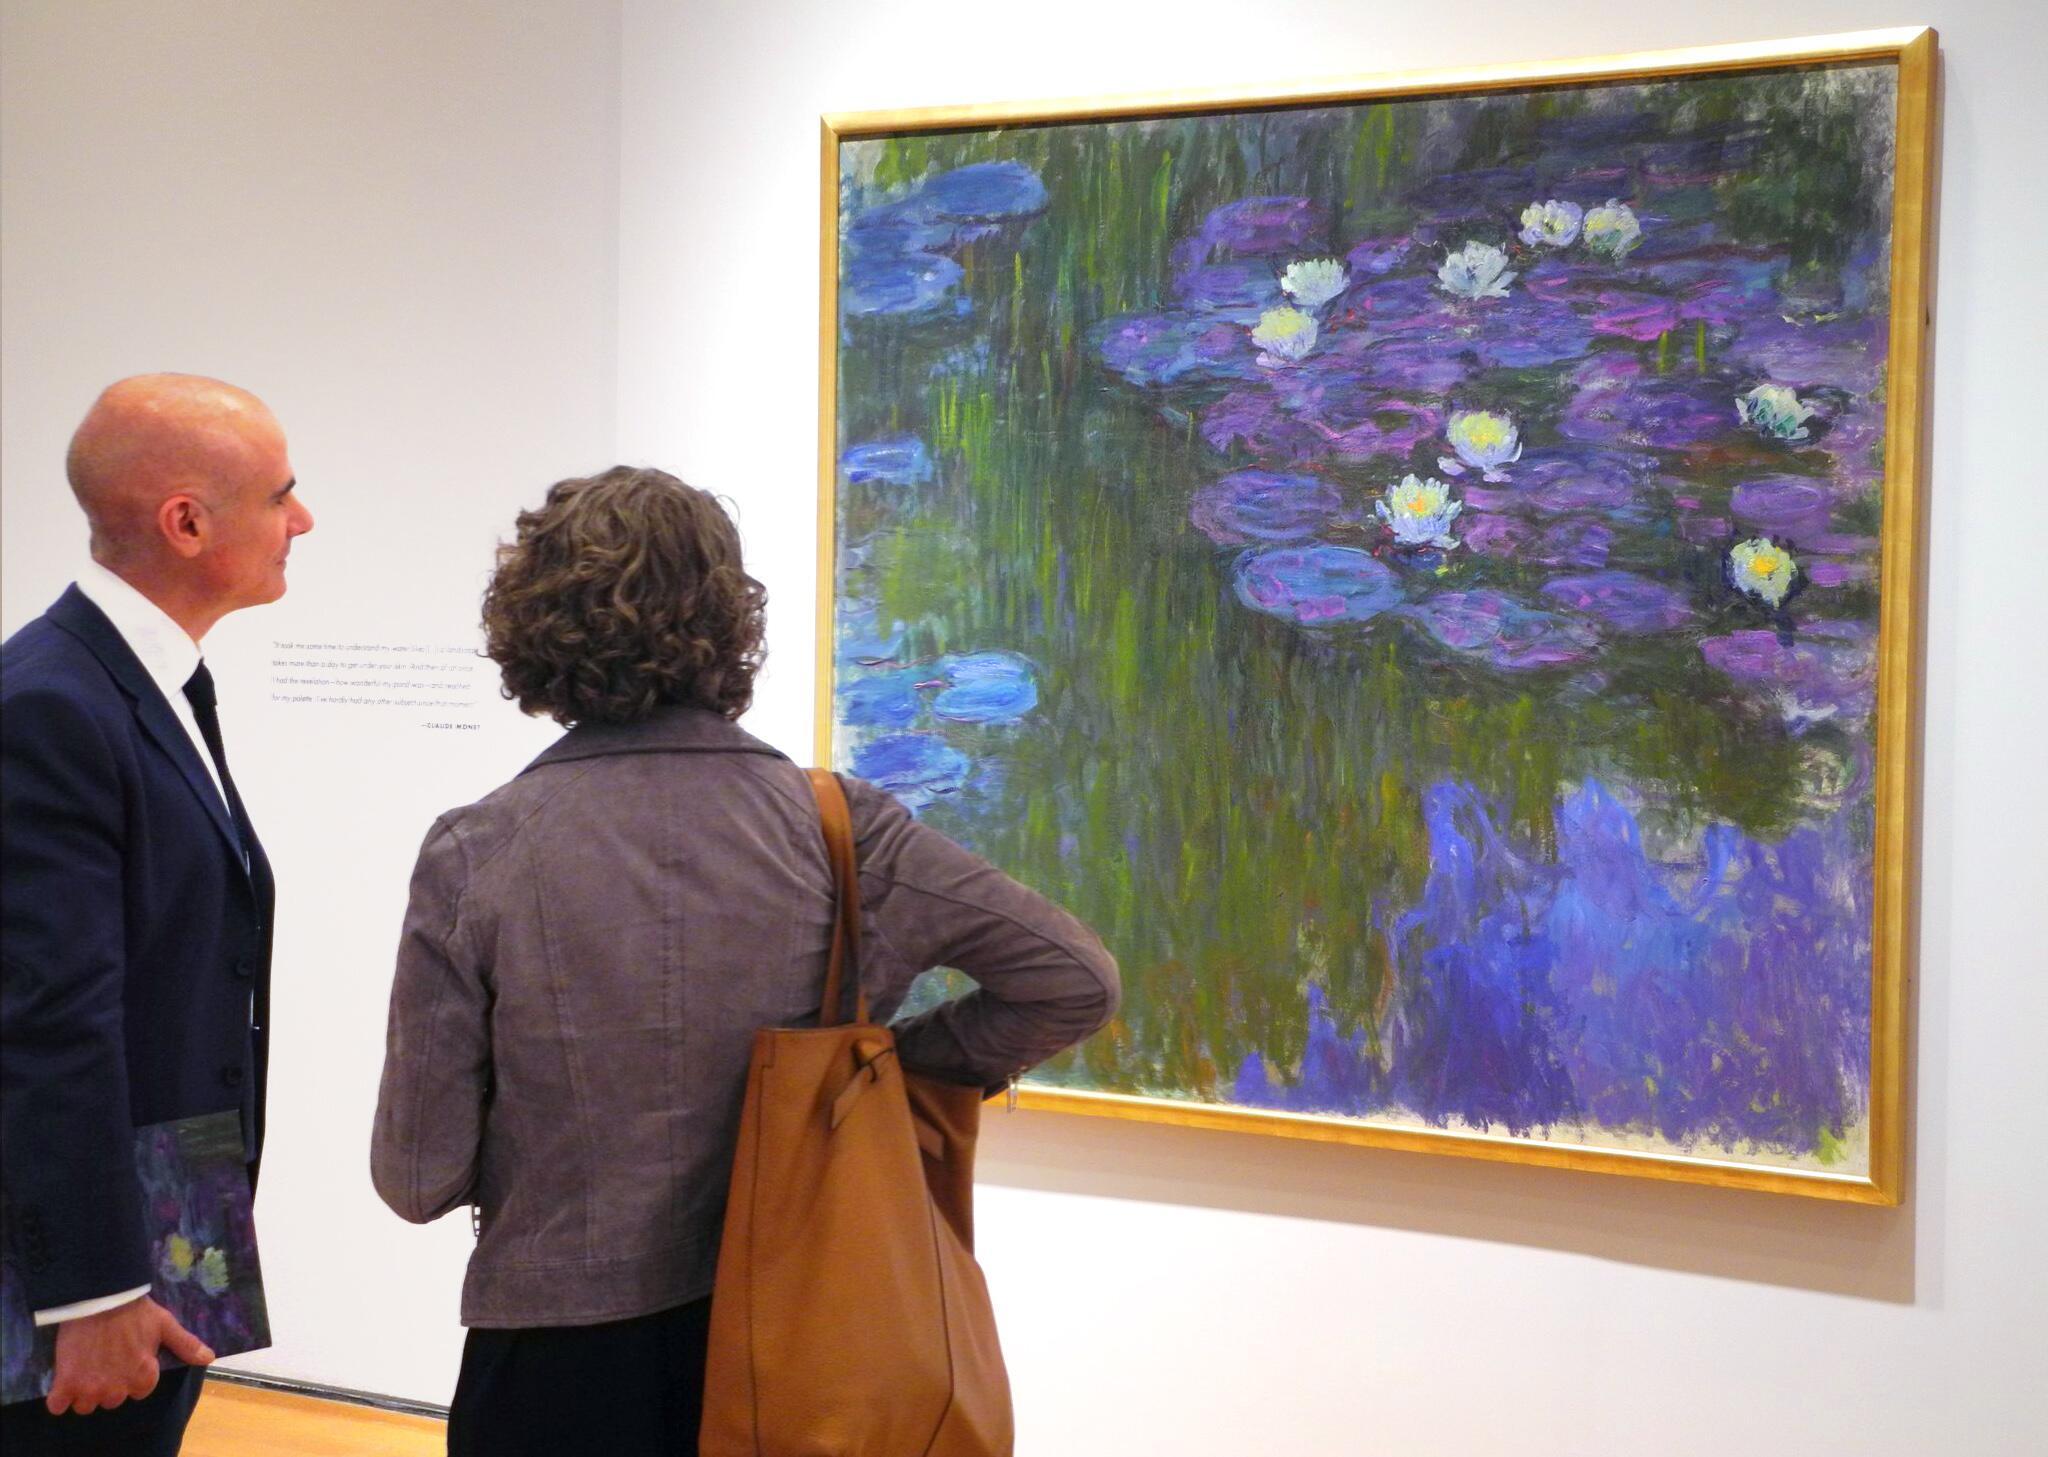 Bild zu Auction of the Art Collection of David Rockefeller